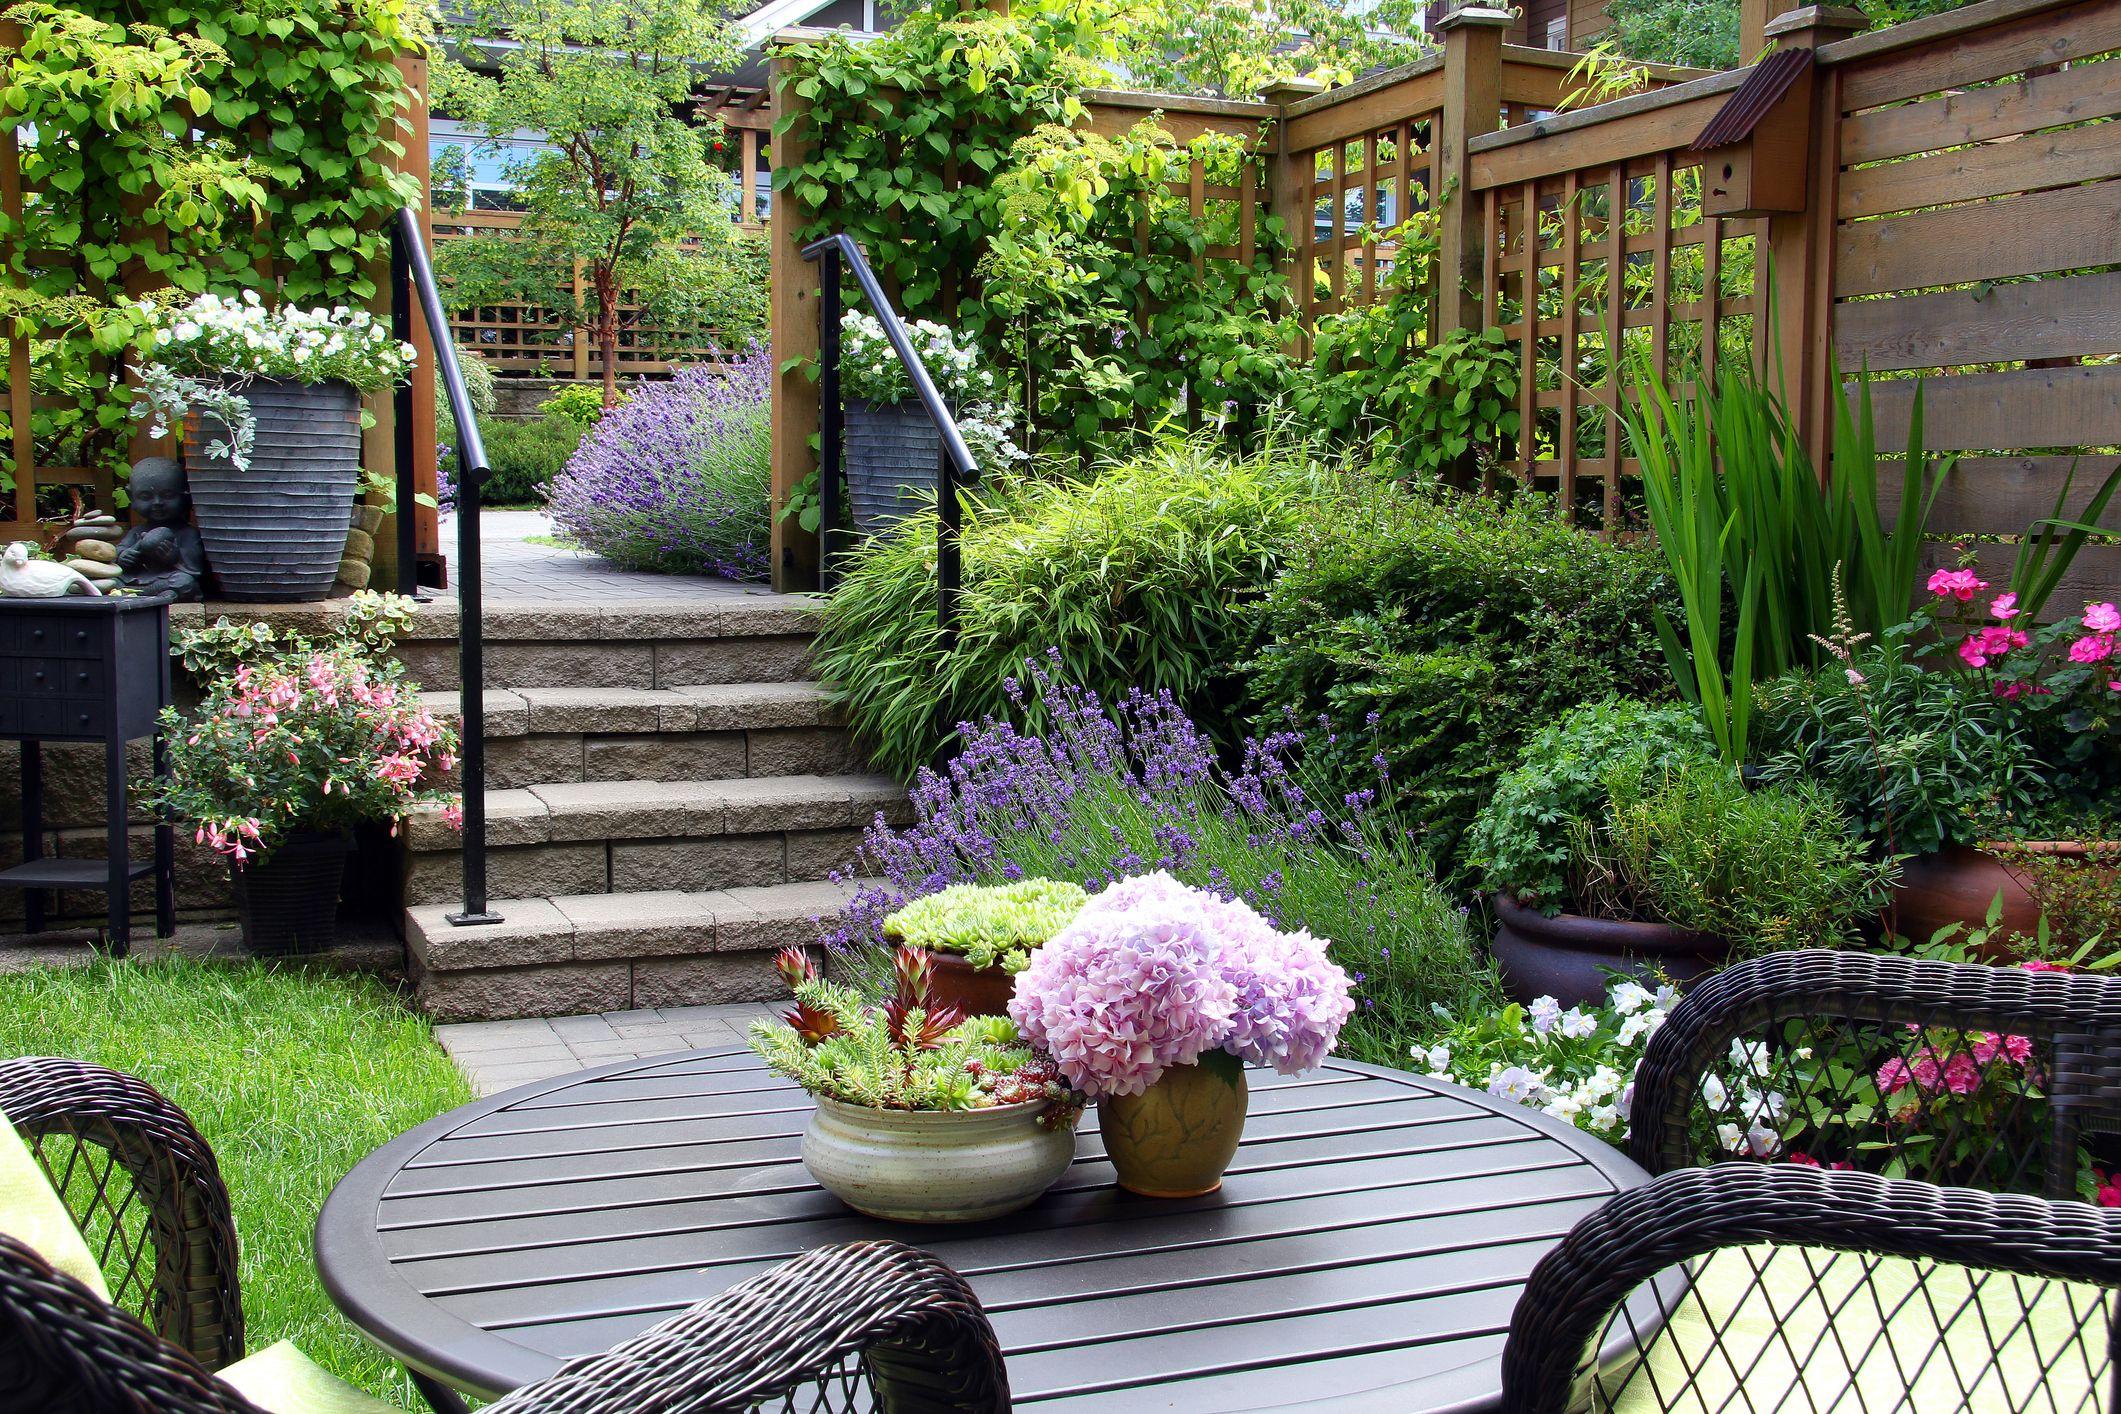 small-garden-royalty-free-image-584877834-1567275605.jpg